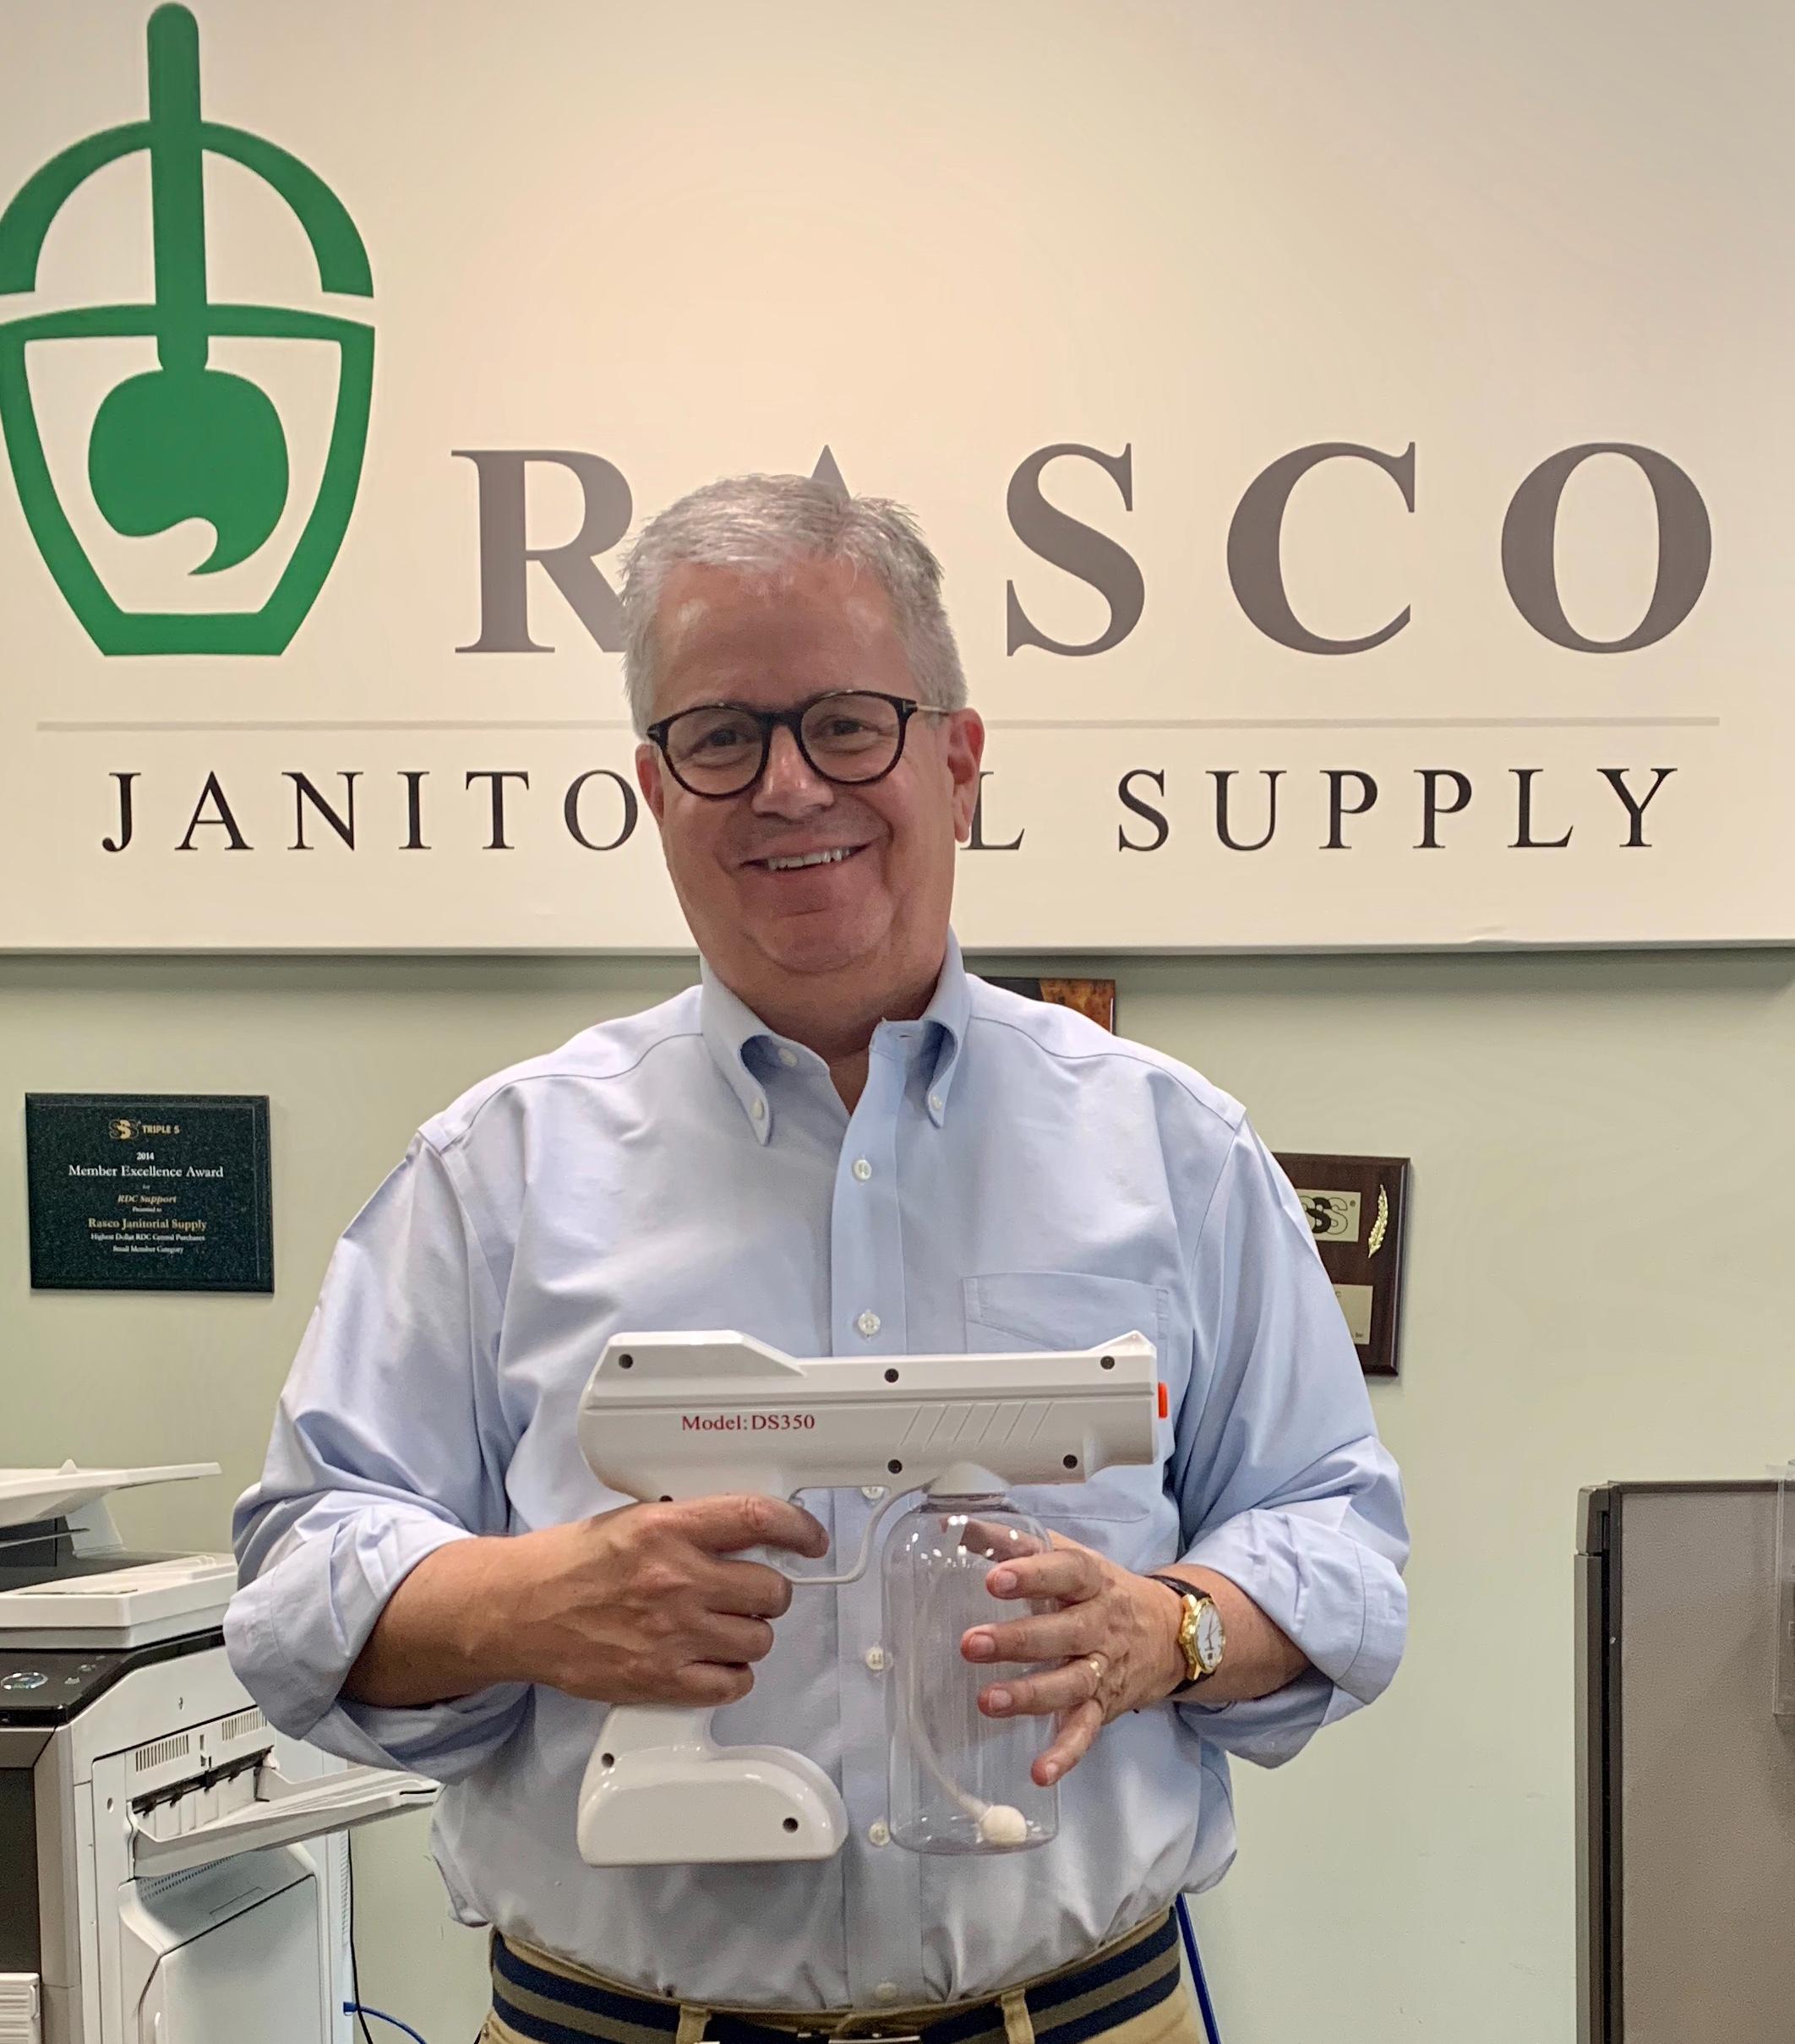 Rasco.Supply RascoStatic